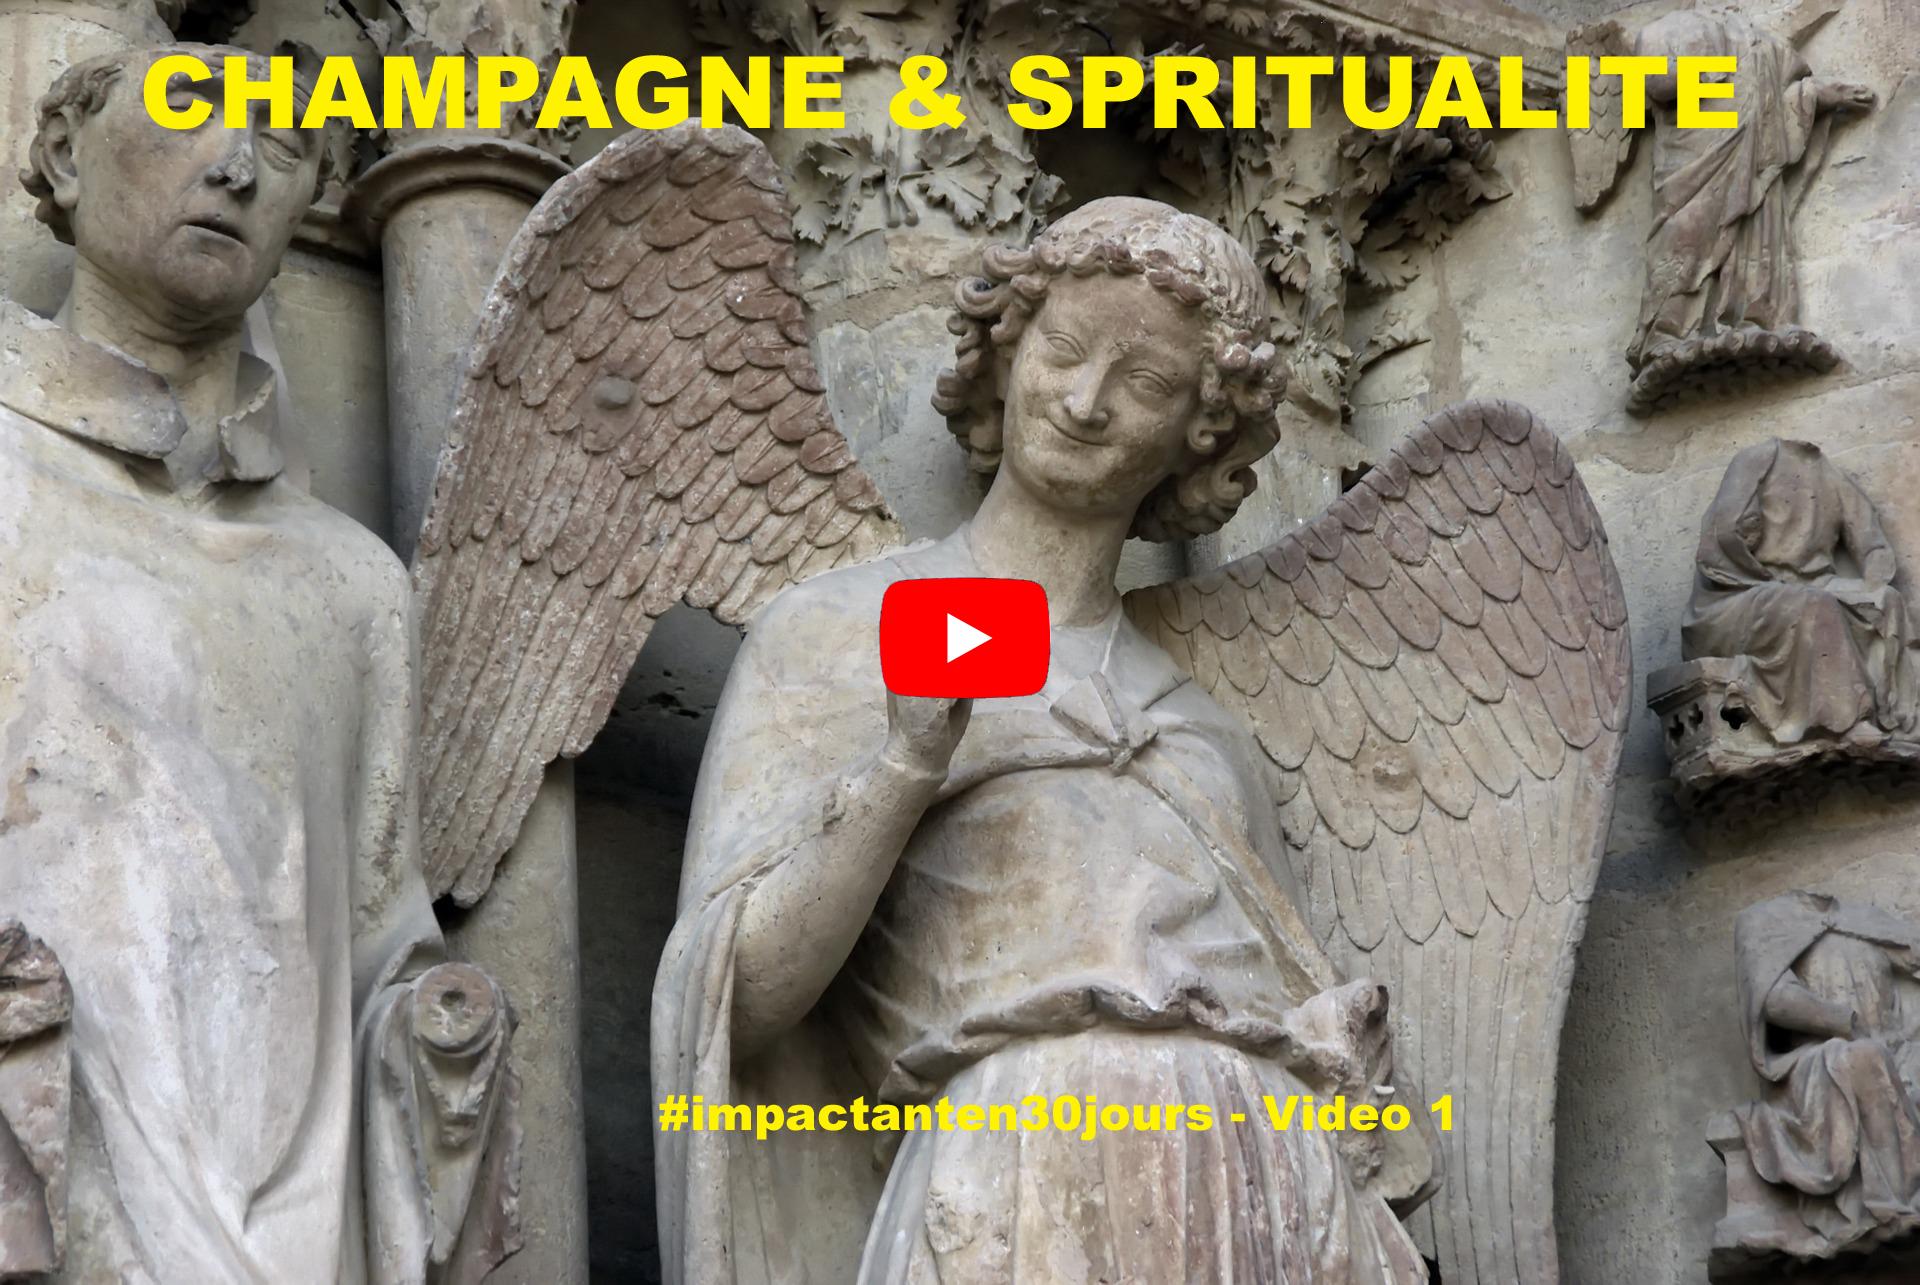 1 Champagne et Spiritualite